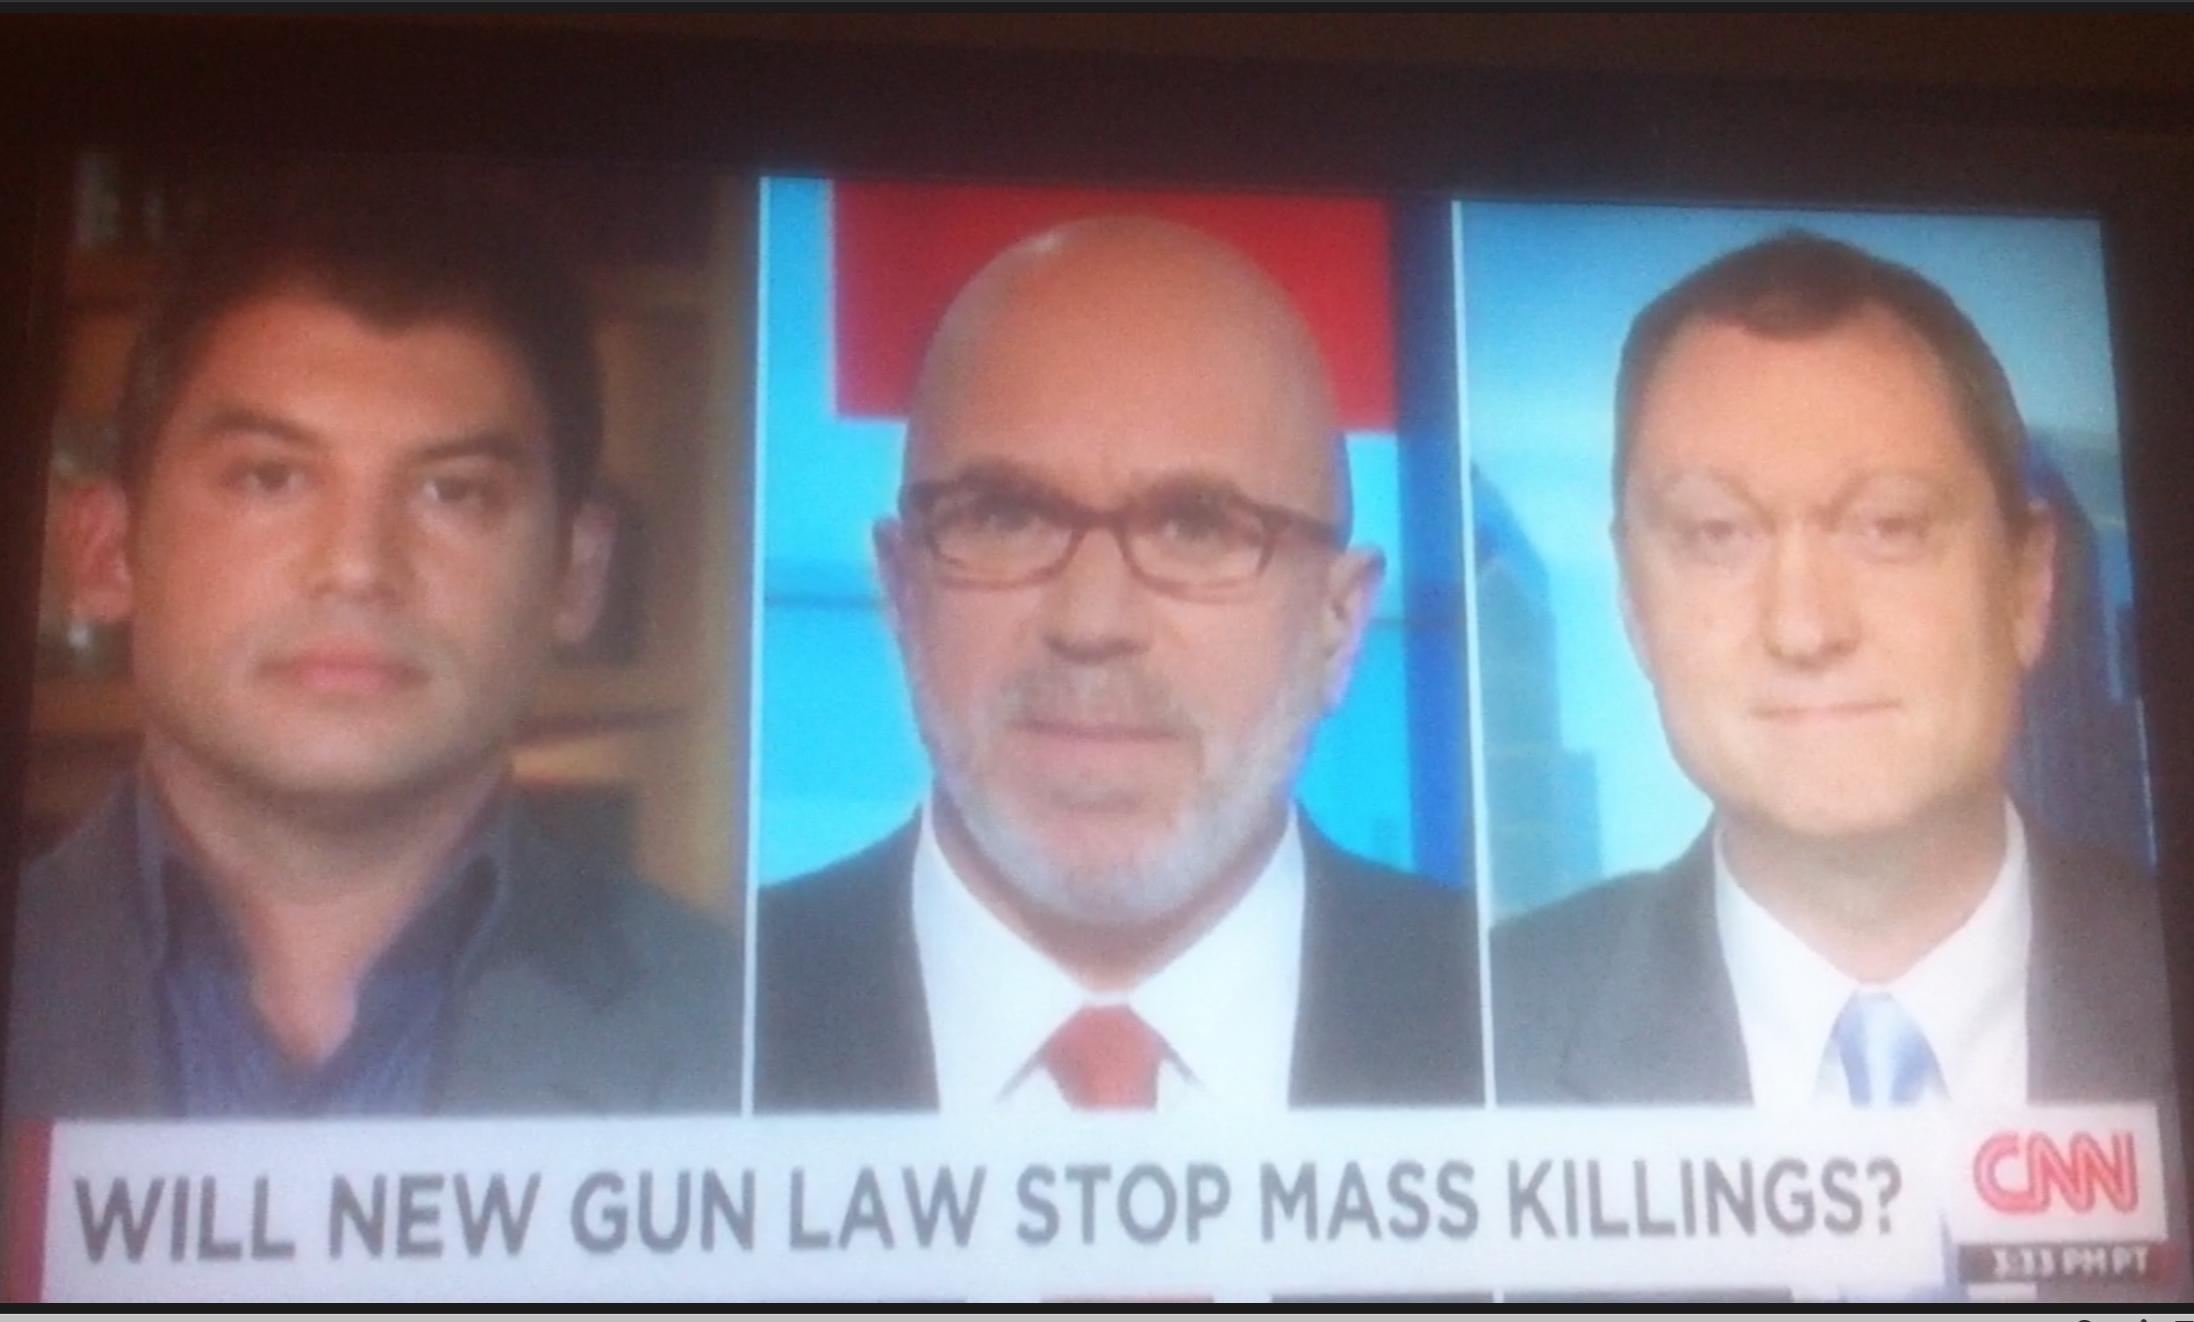 CNN Update: CPRC On CNN: Notes On California's New Gun Violence